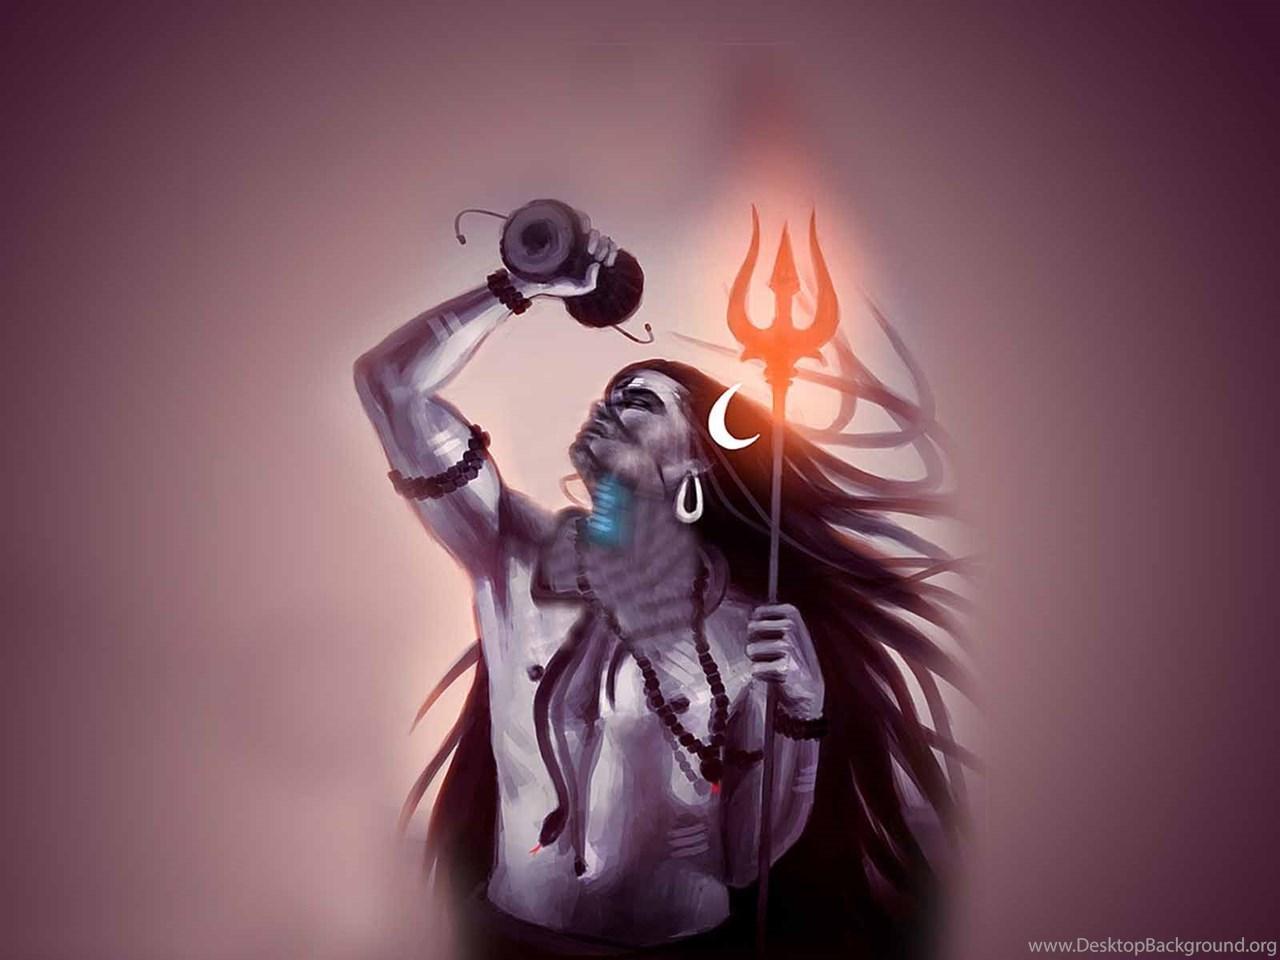 1366x768 Lord Shiva Desktop Background: God Lord Shiva Hd Wallpapers Desktop Background